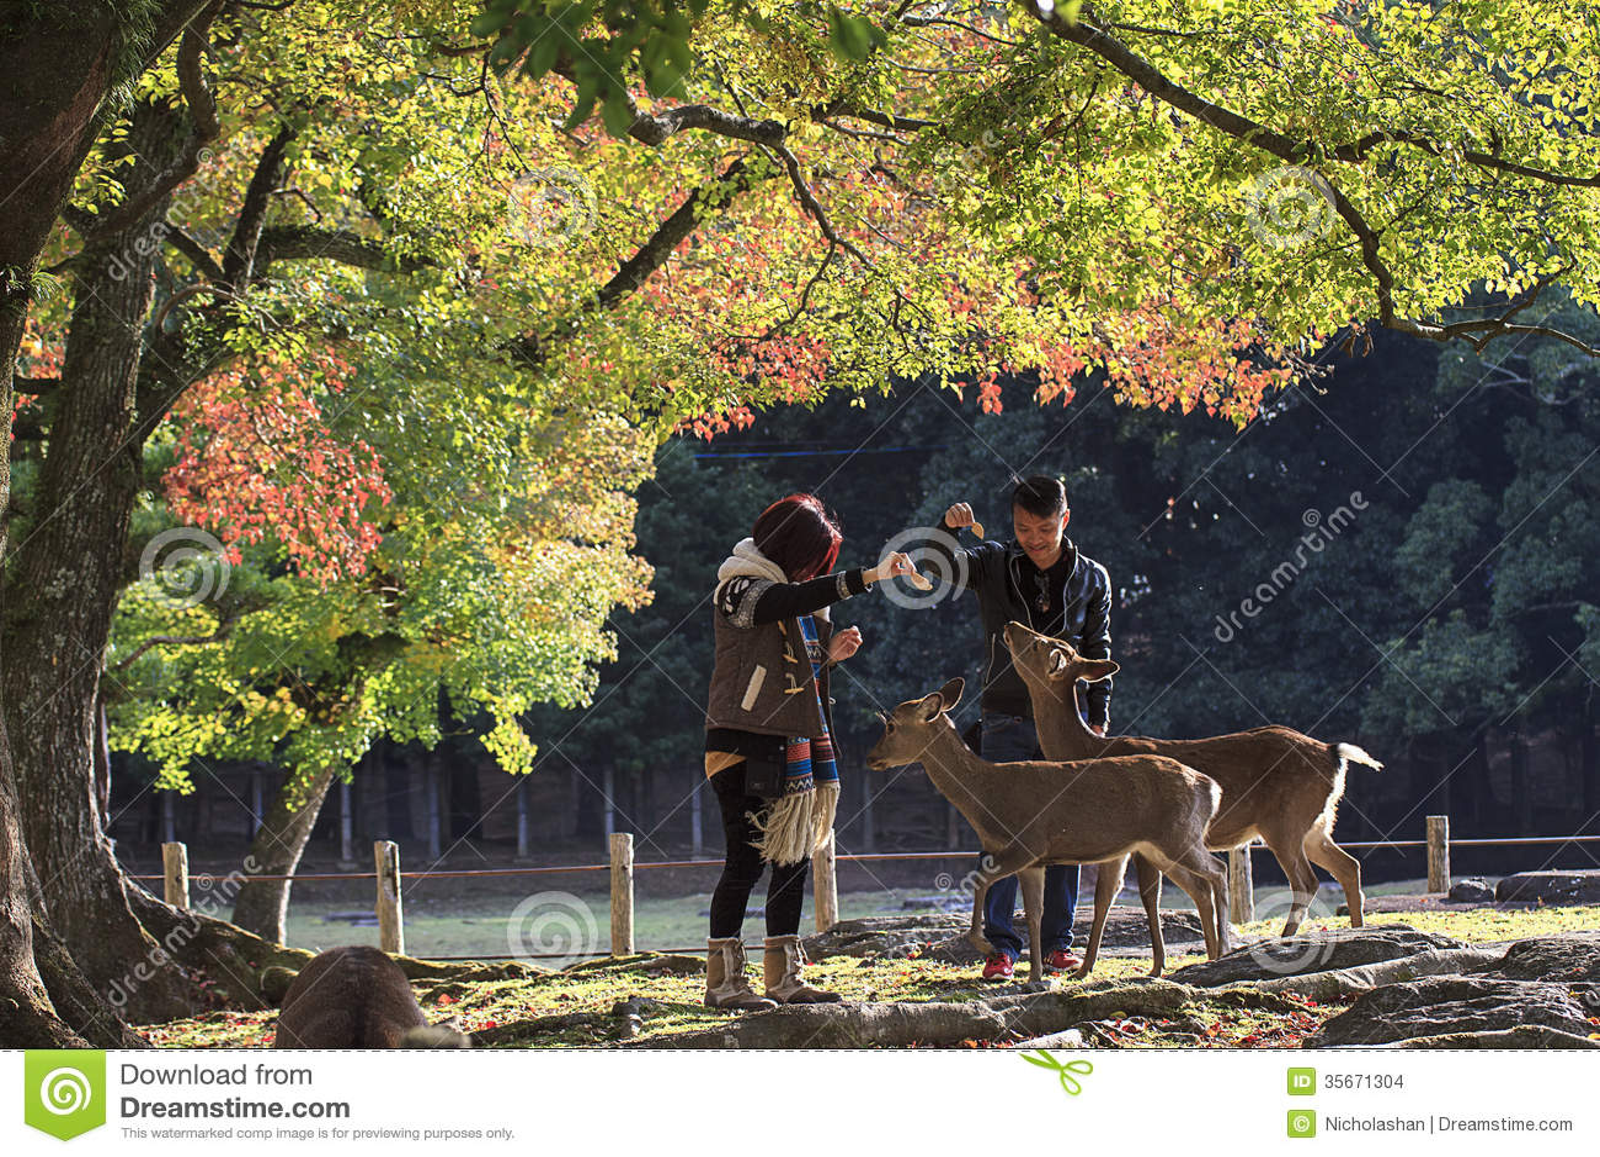 ShuYou-Ikaruga Nara Tourism VR- on the App Store